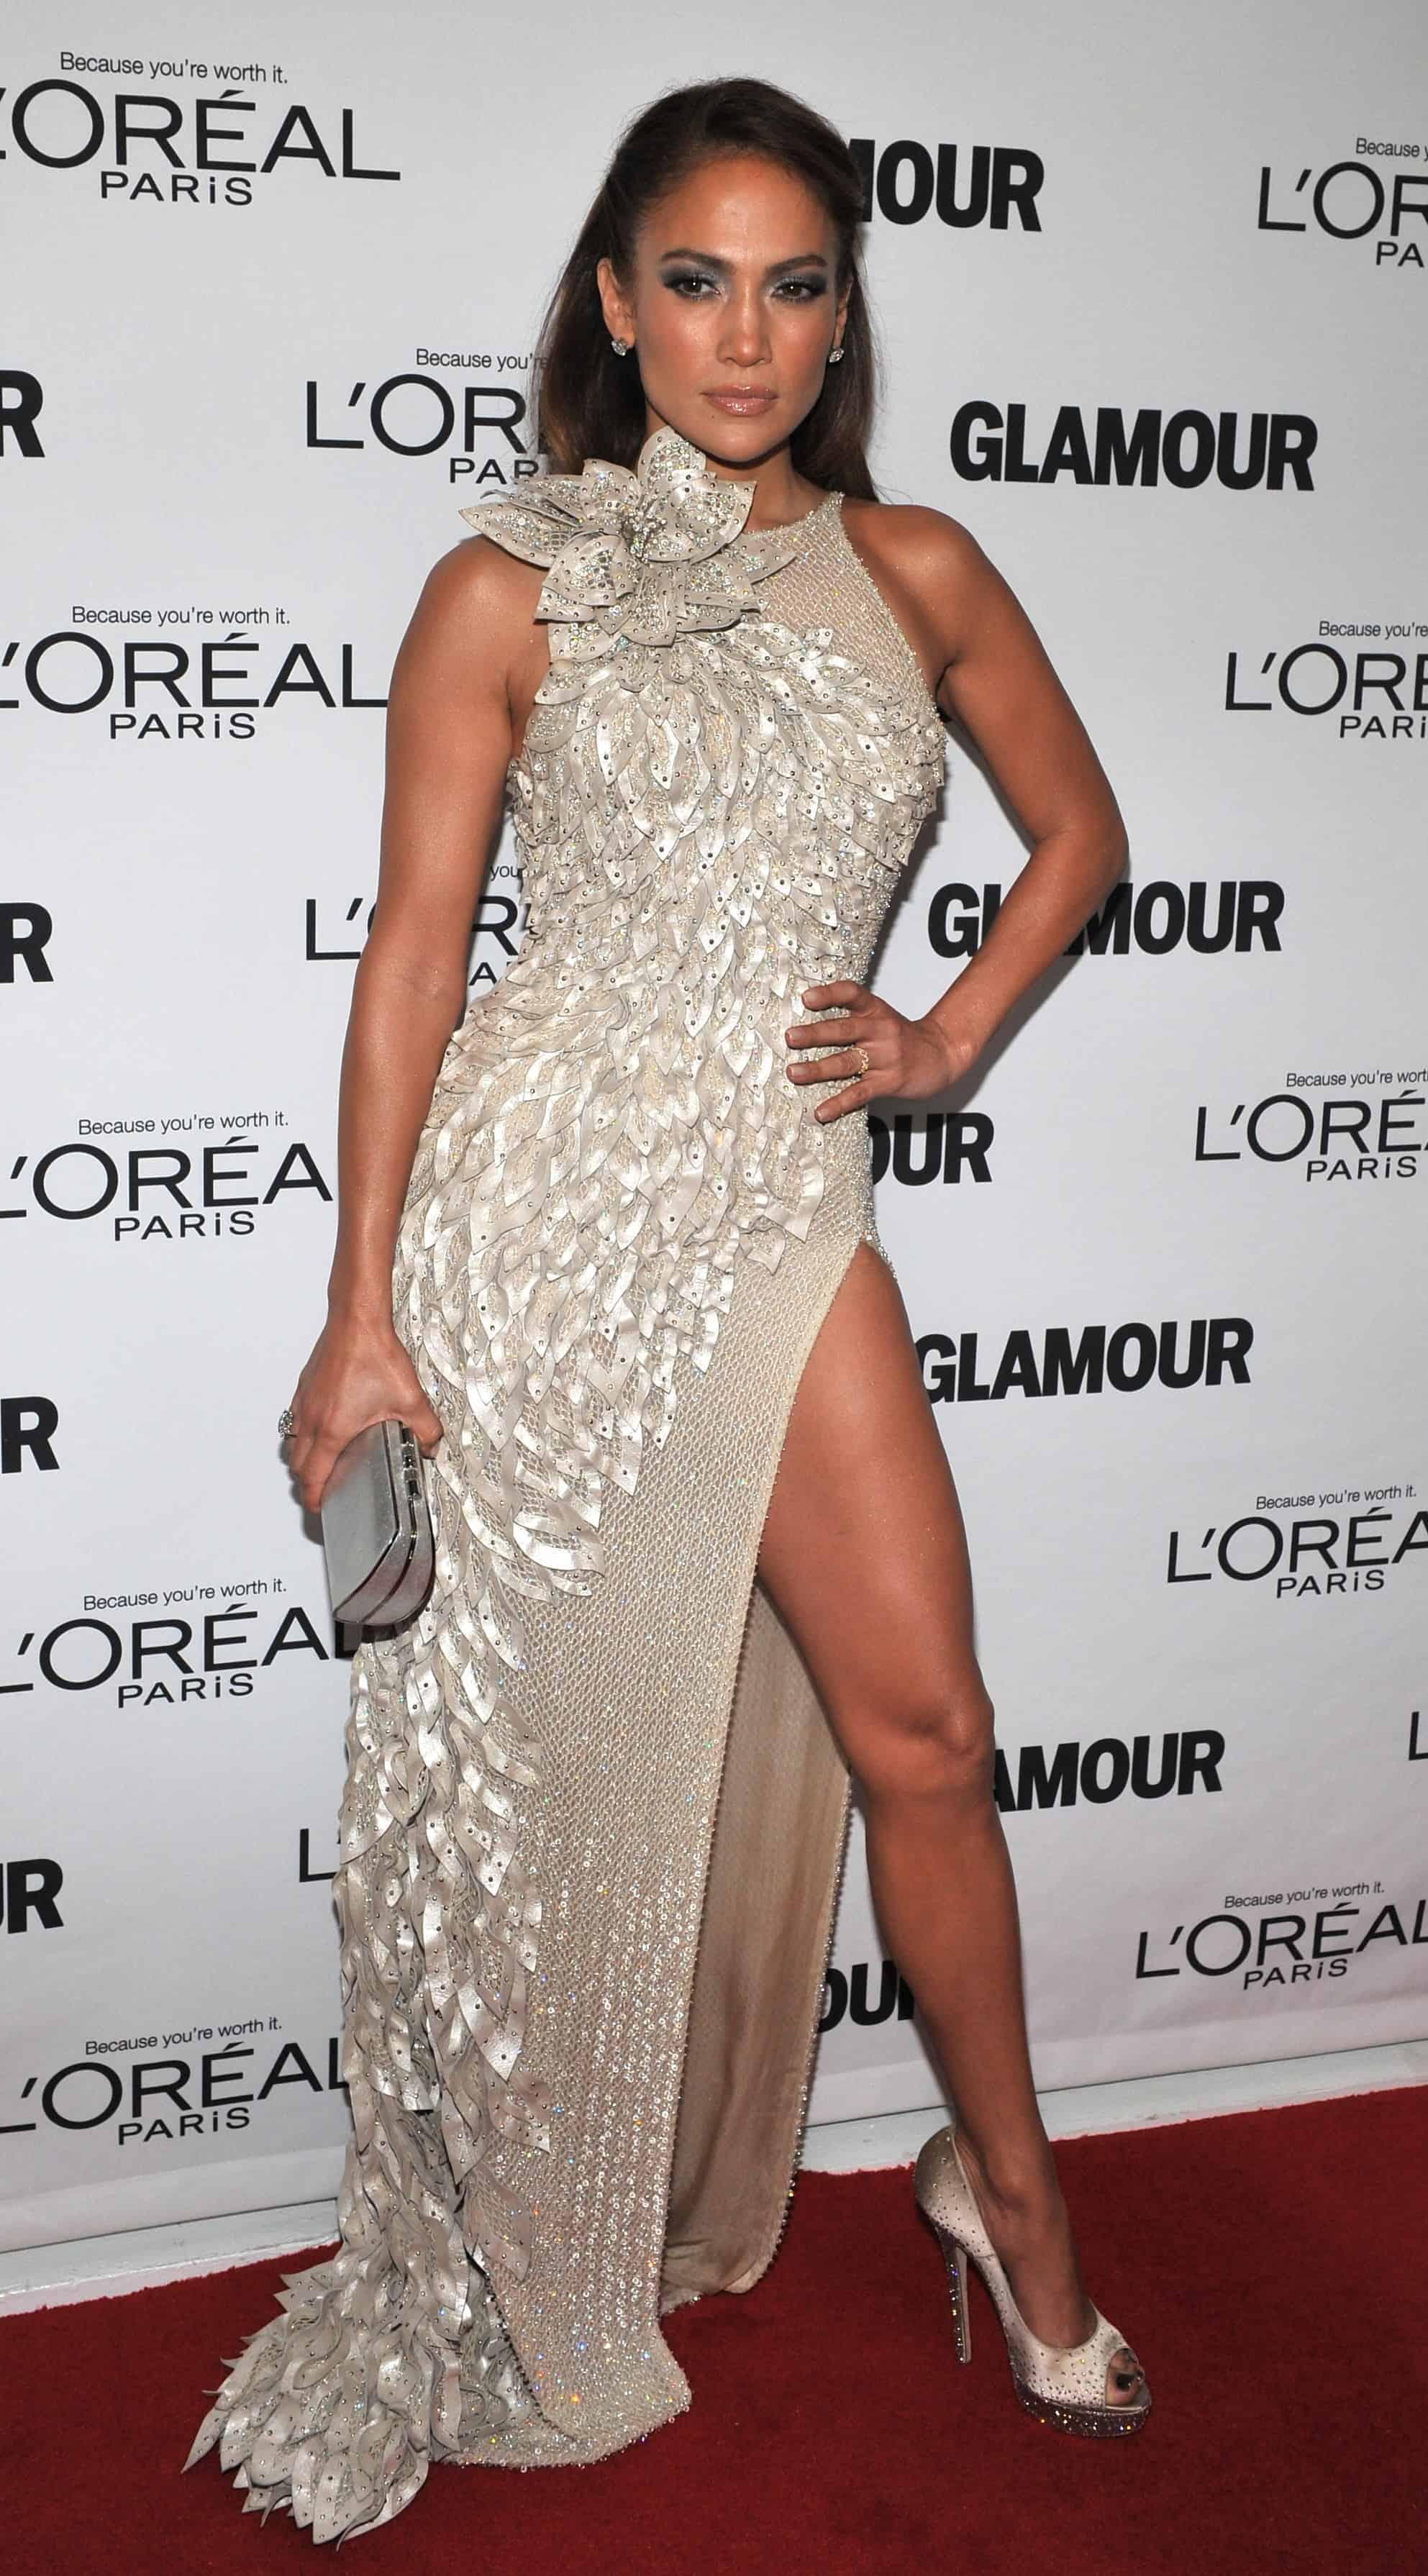 Is Max Hookup Meryl Or Jennifer Lopez